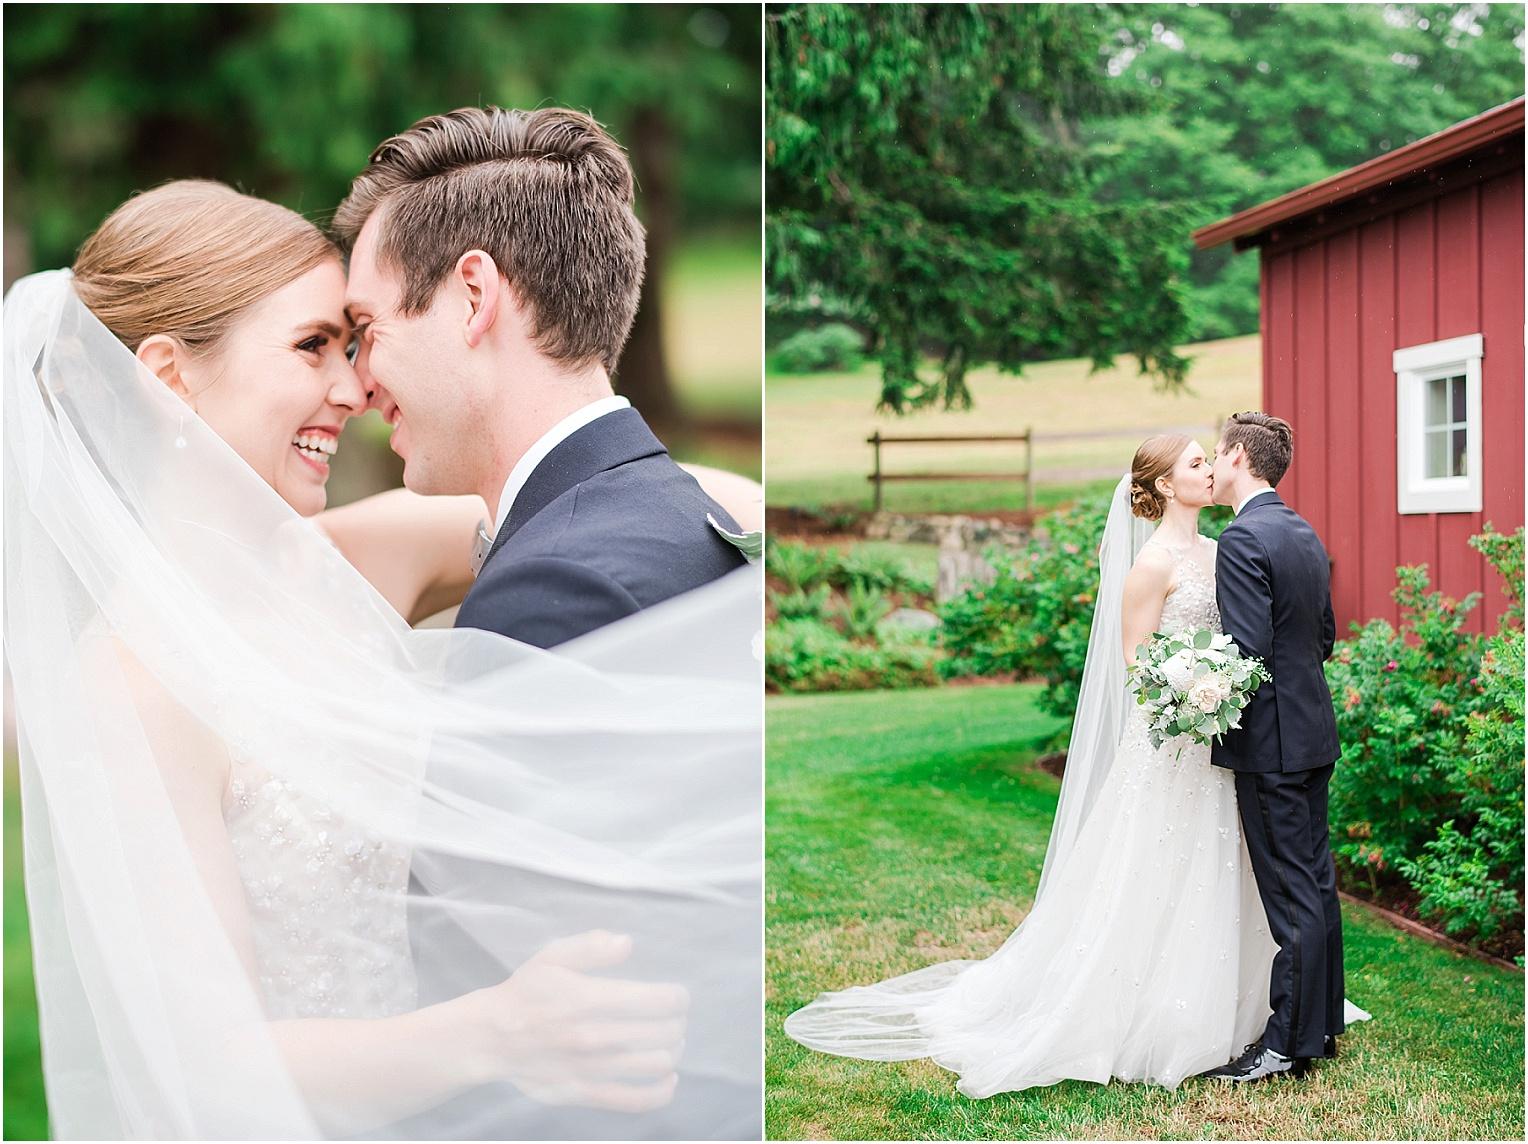 509 Bride_Misty C Photography_4